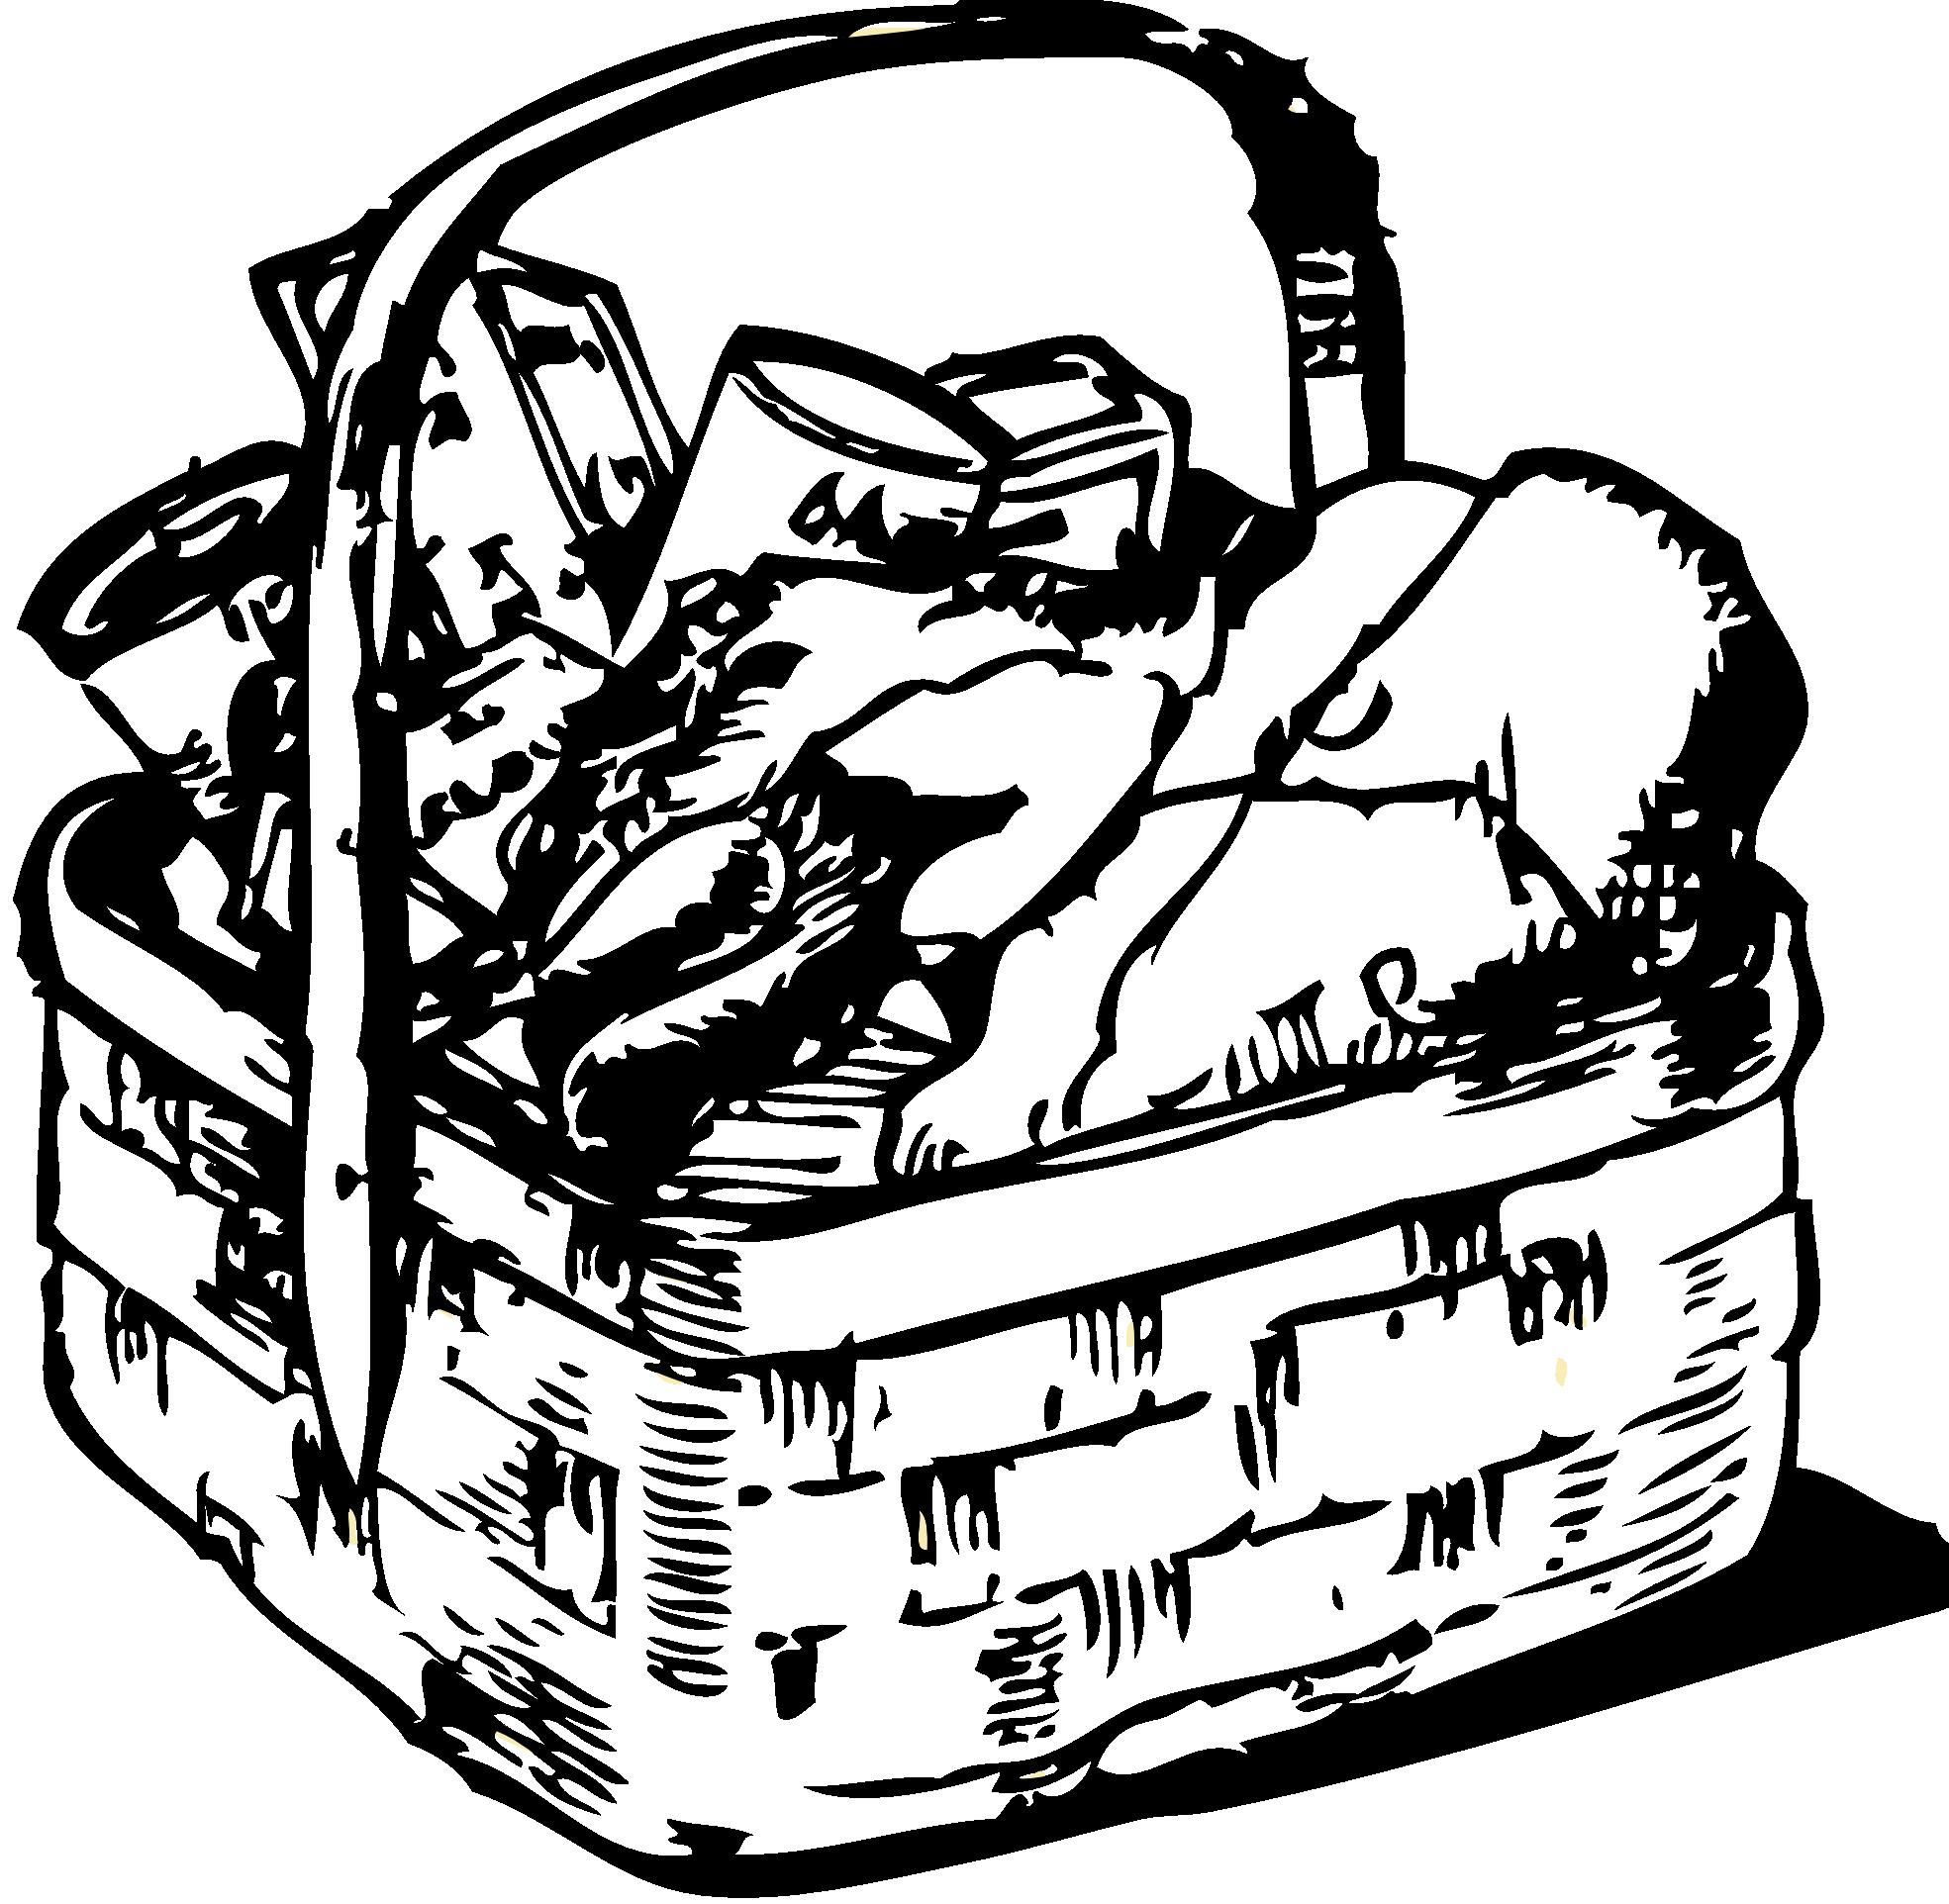 1969x1924 Picnic Basket Clipart Black And White Clipartfox 2